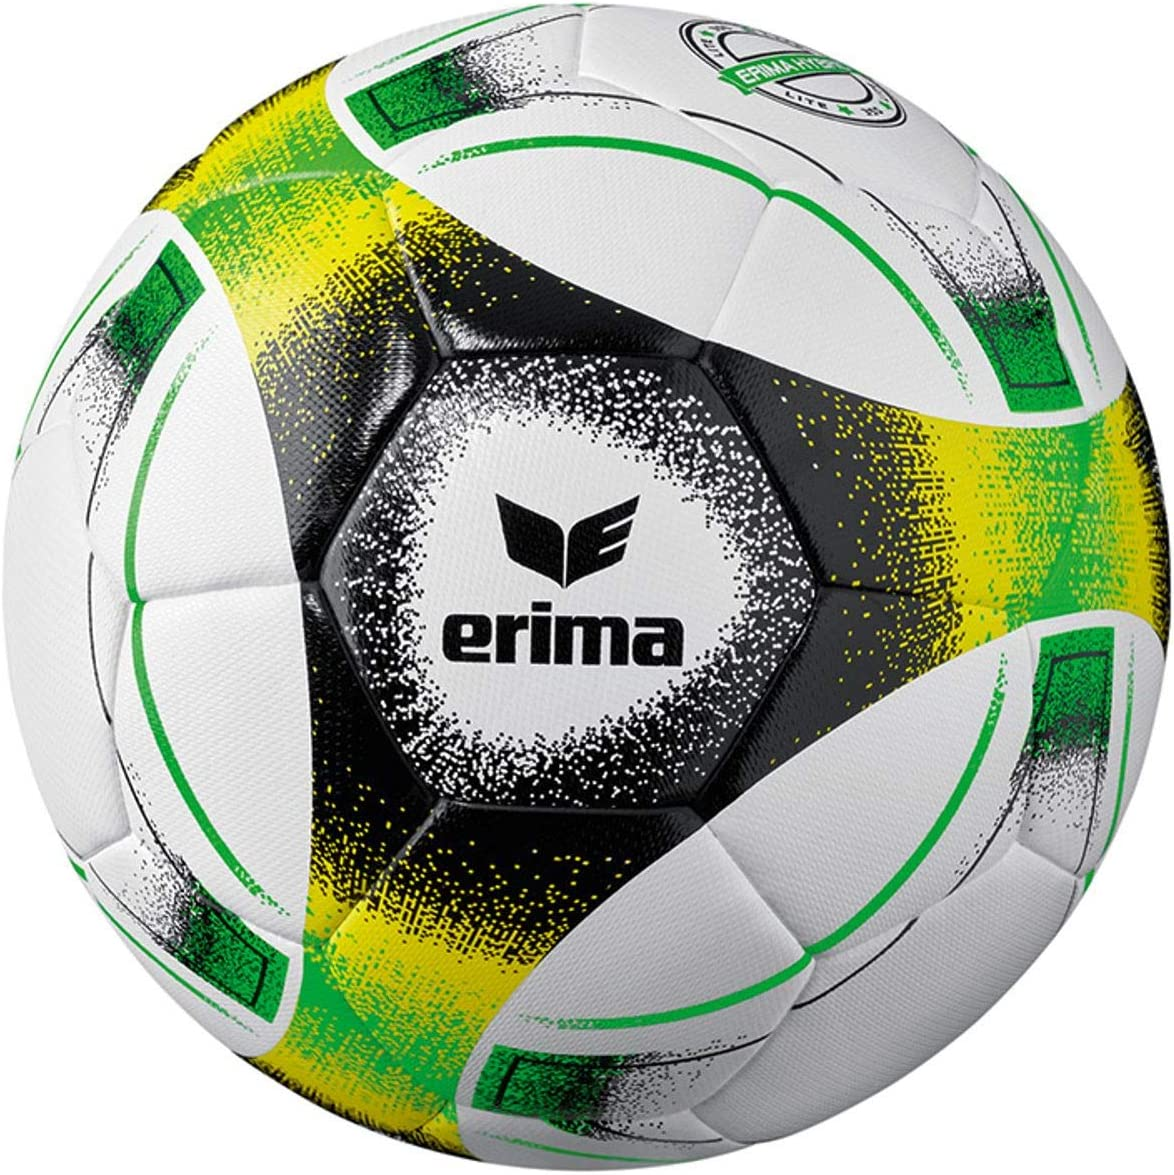 Erima Unisex/ Erwachsene Hybrid Lite 350 Fu/ßball